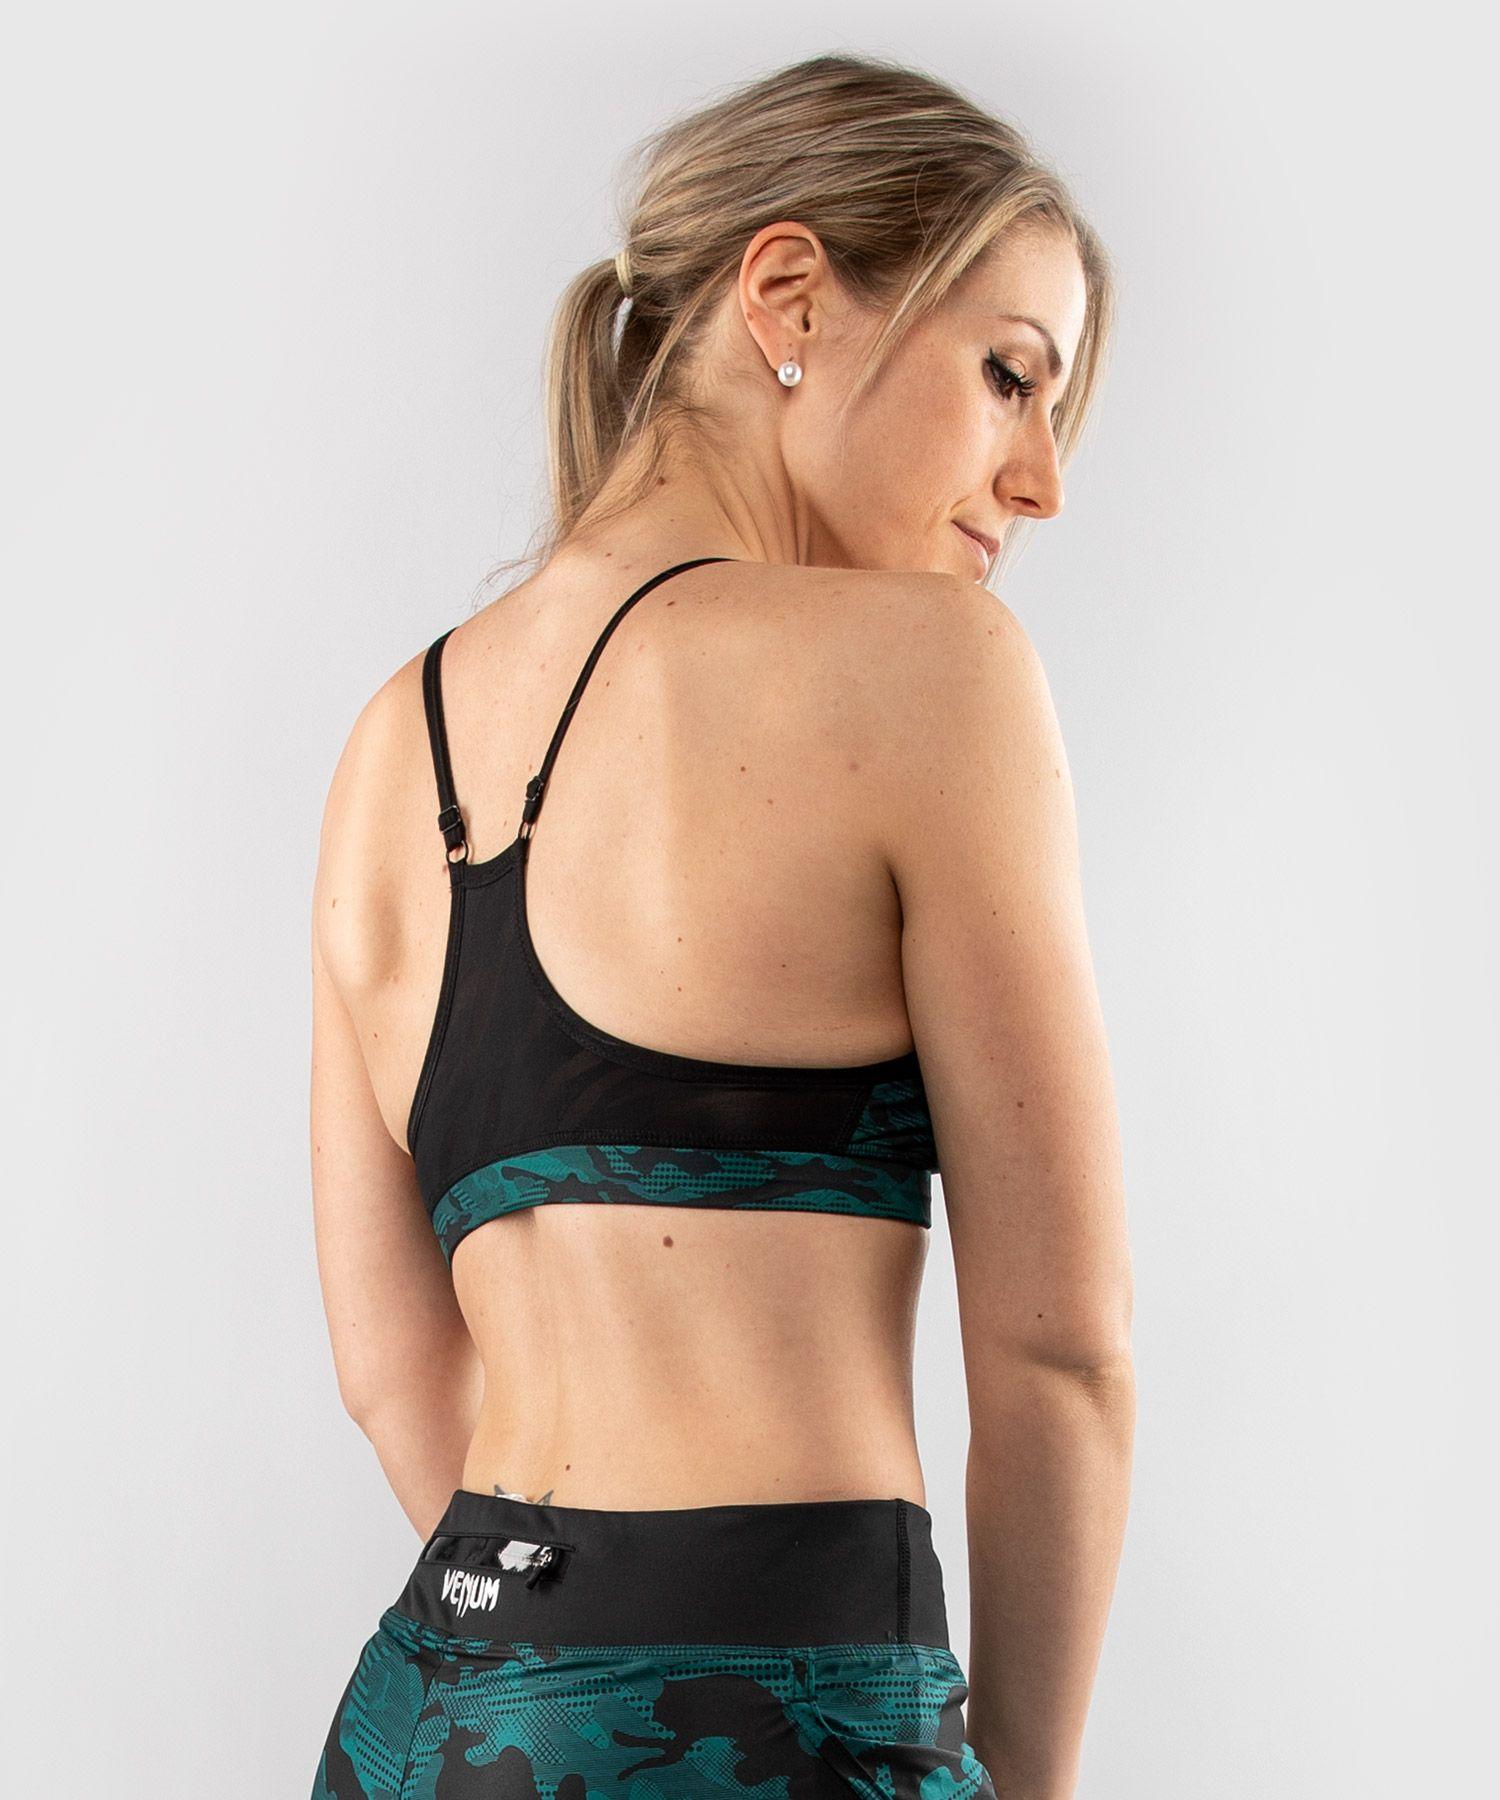 Venum Defender bras - for women - Black/Green